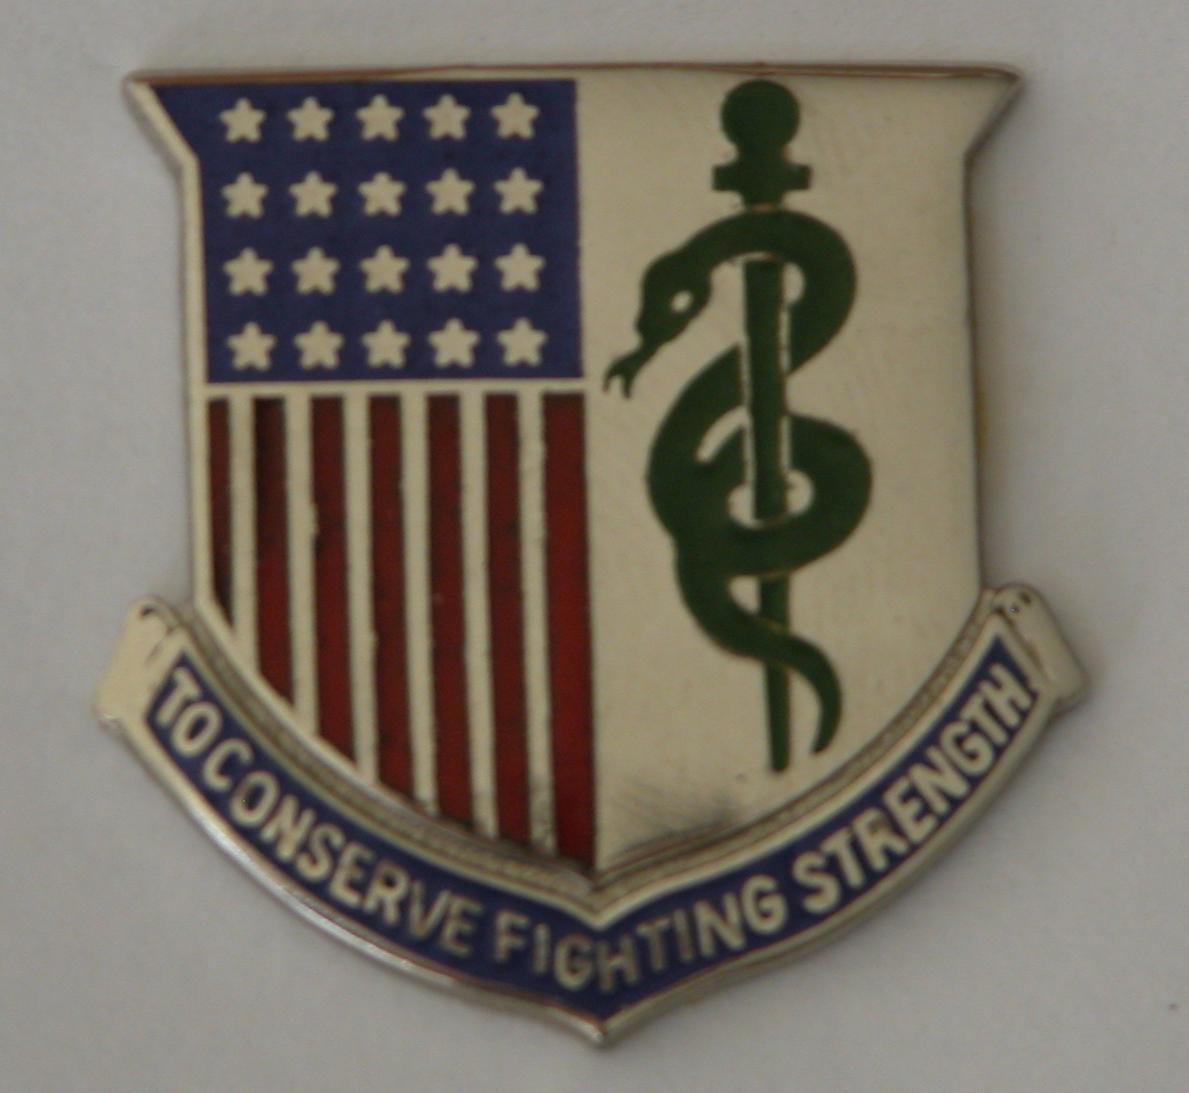 Yongsan Army Center Medical